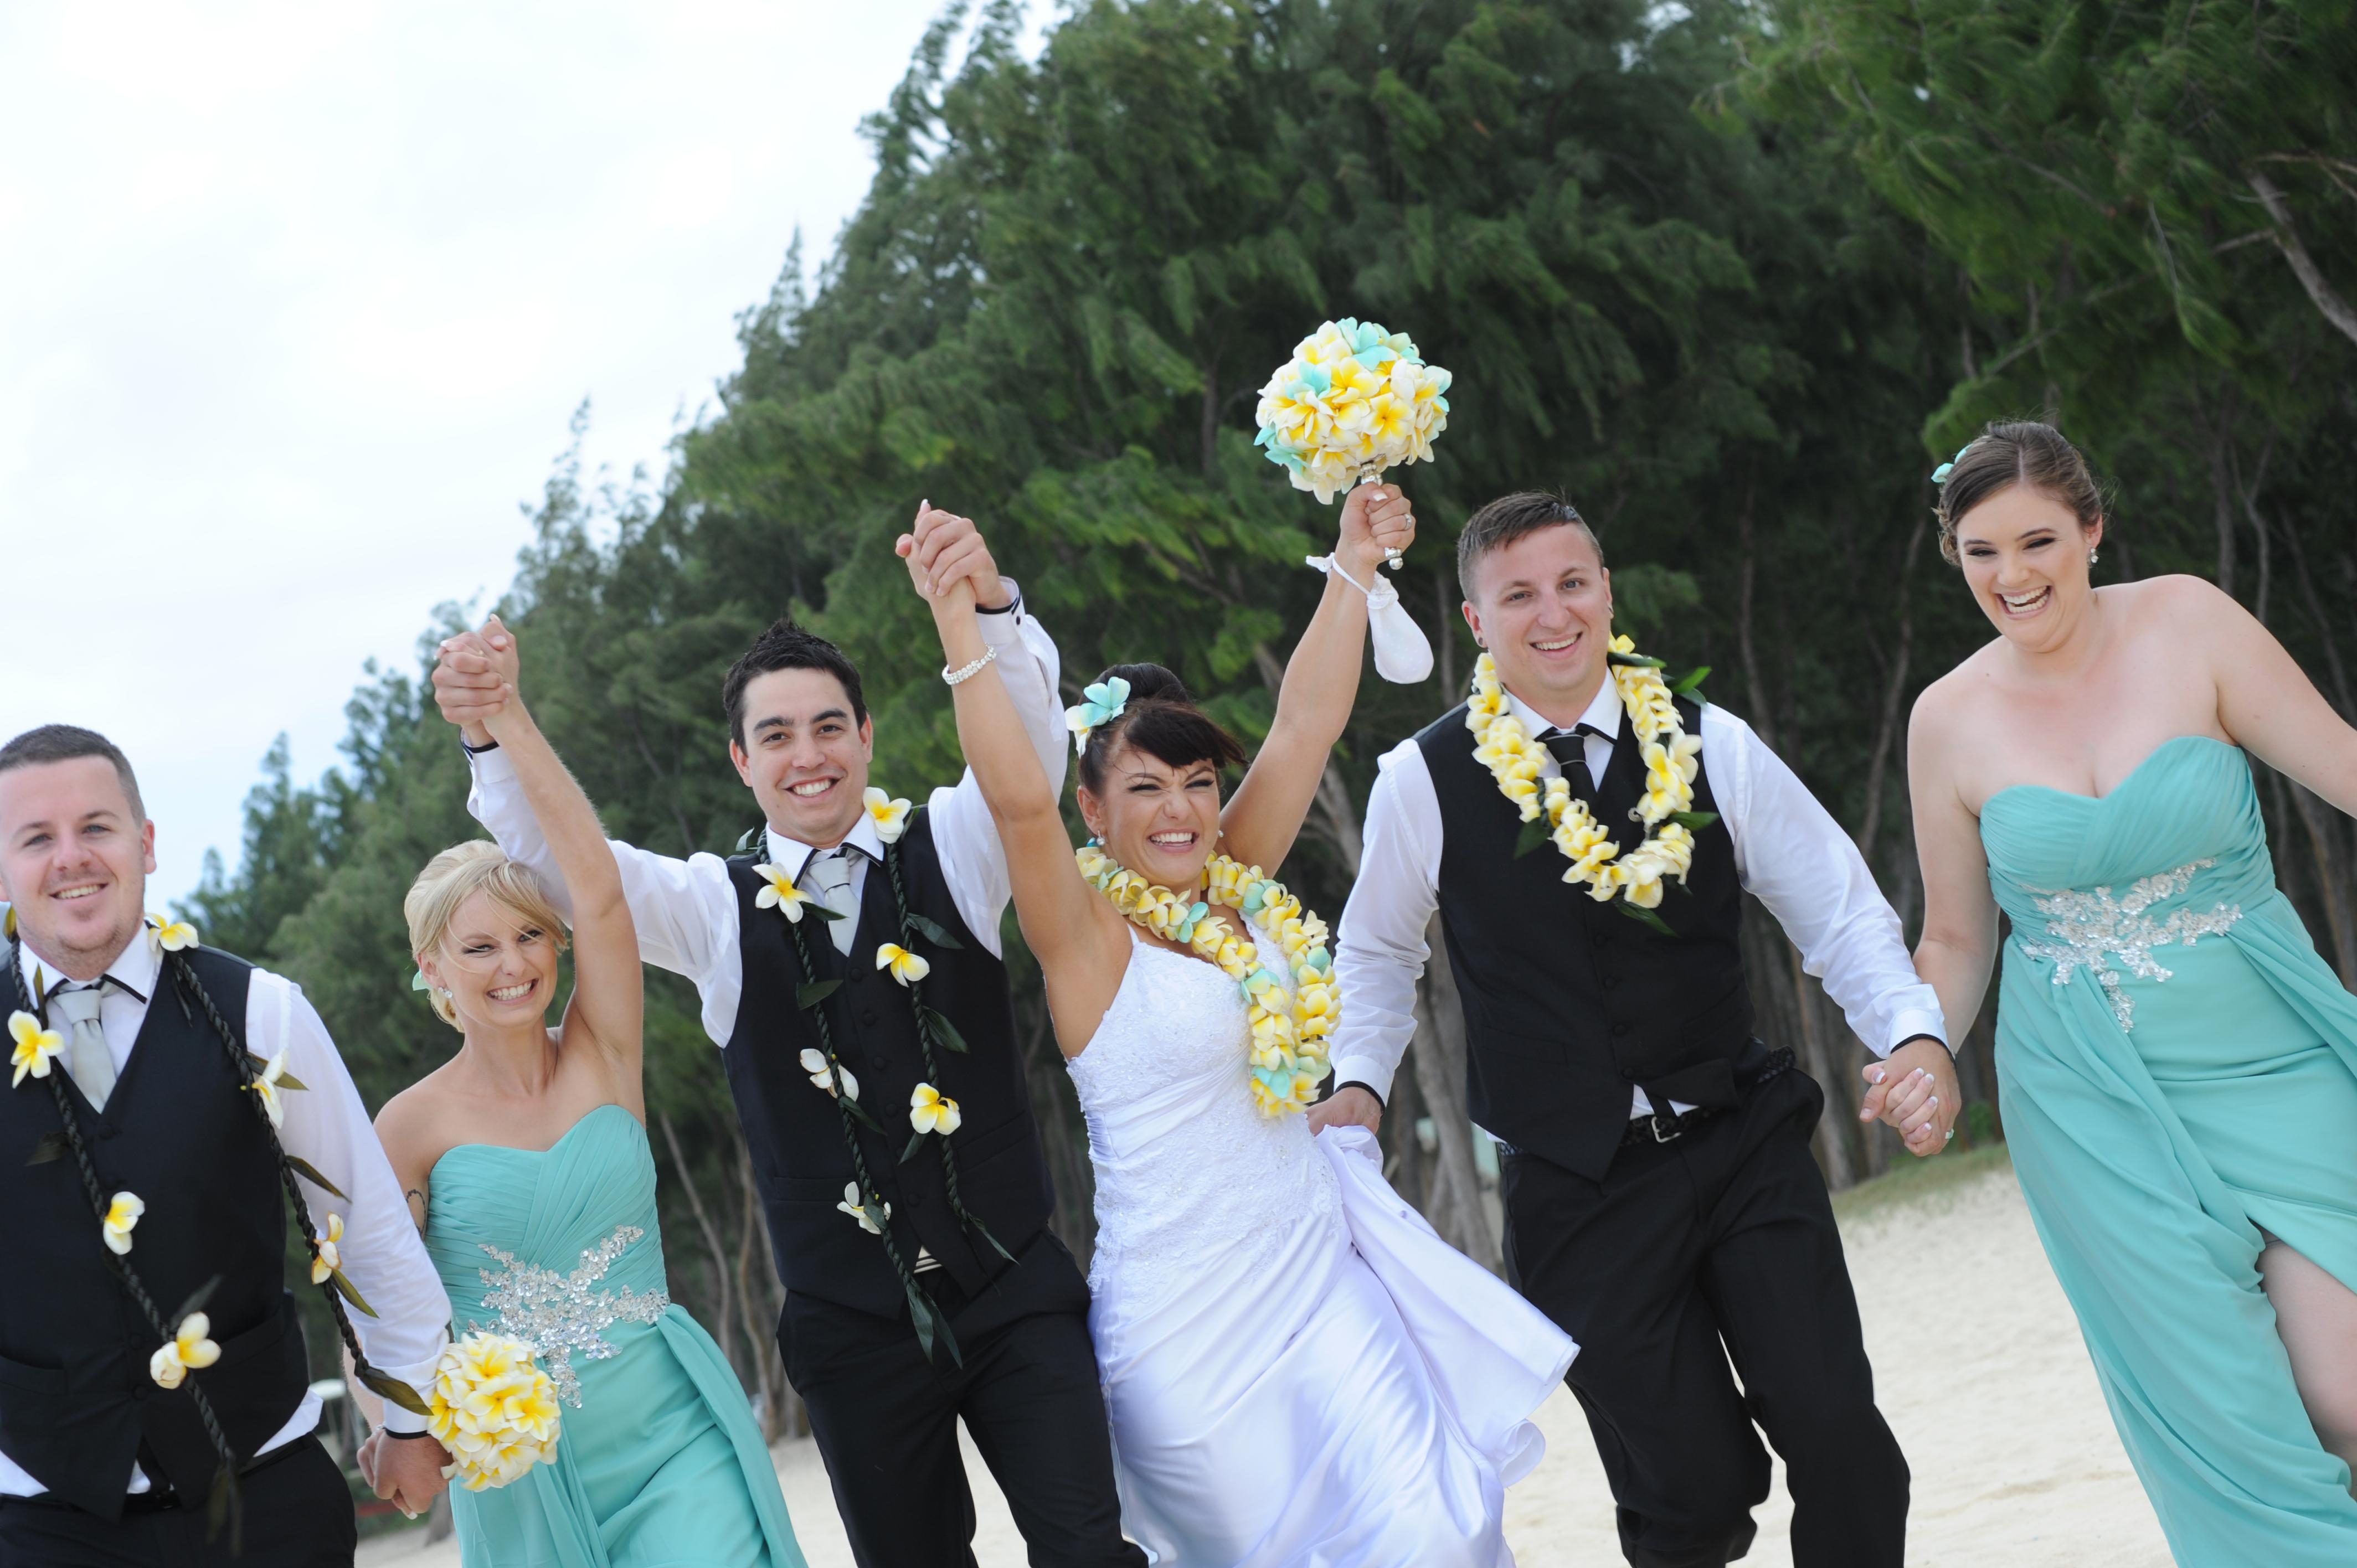 Alohaislandweddings.com- Wedding Picture in Hawaii-19